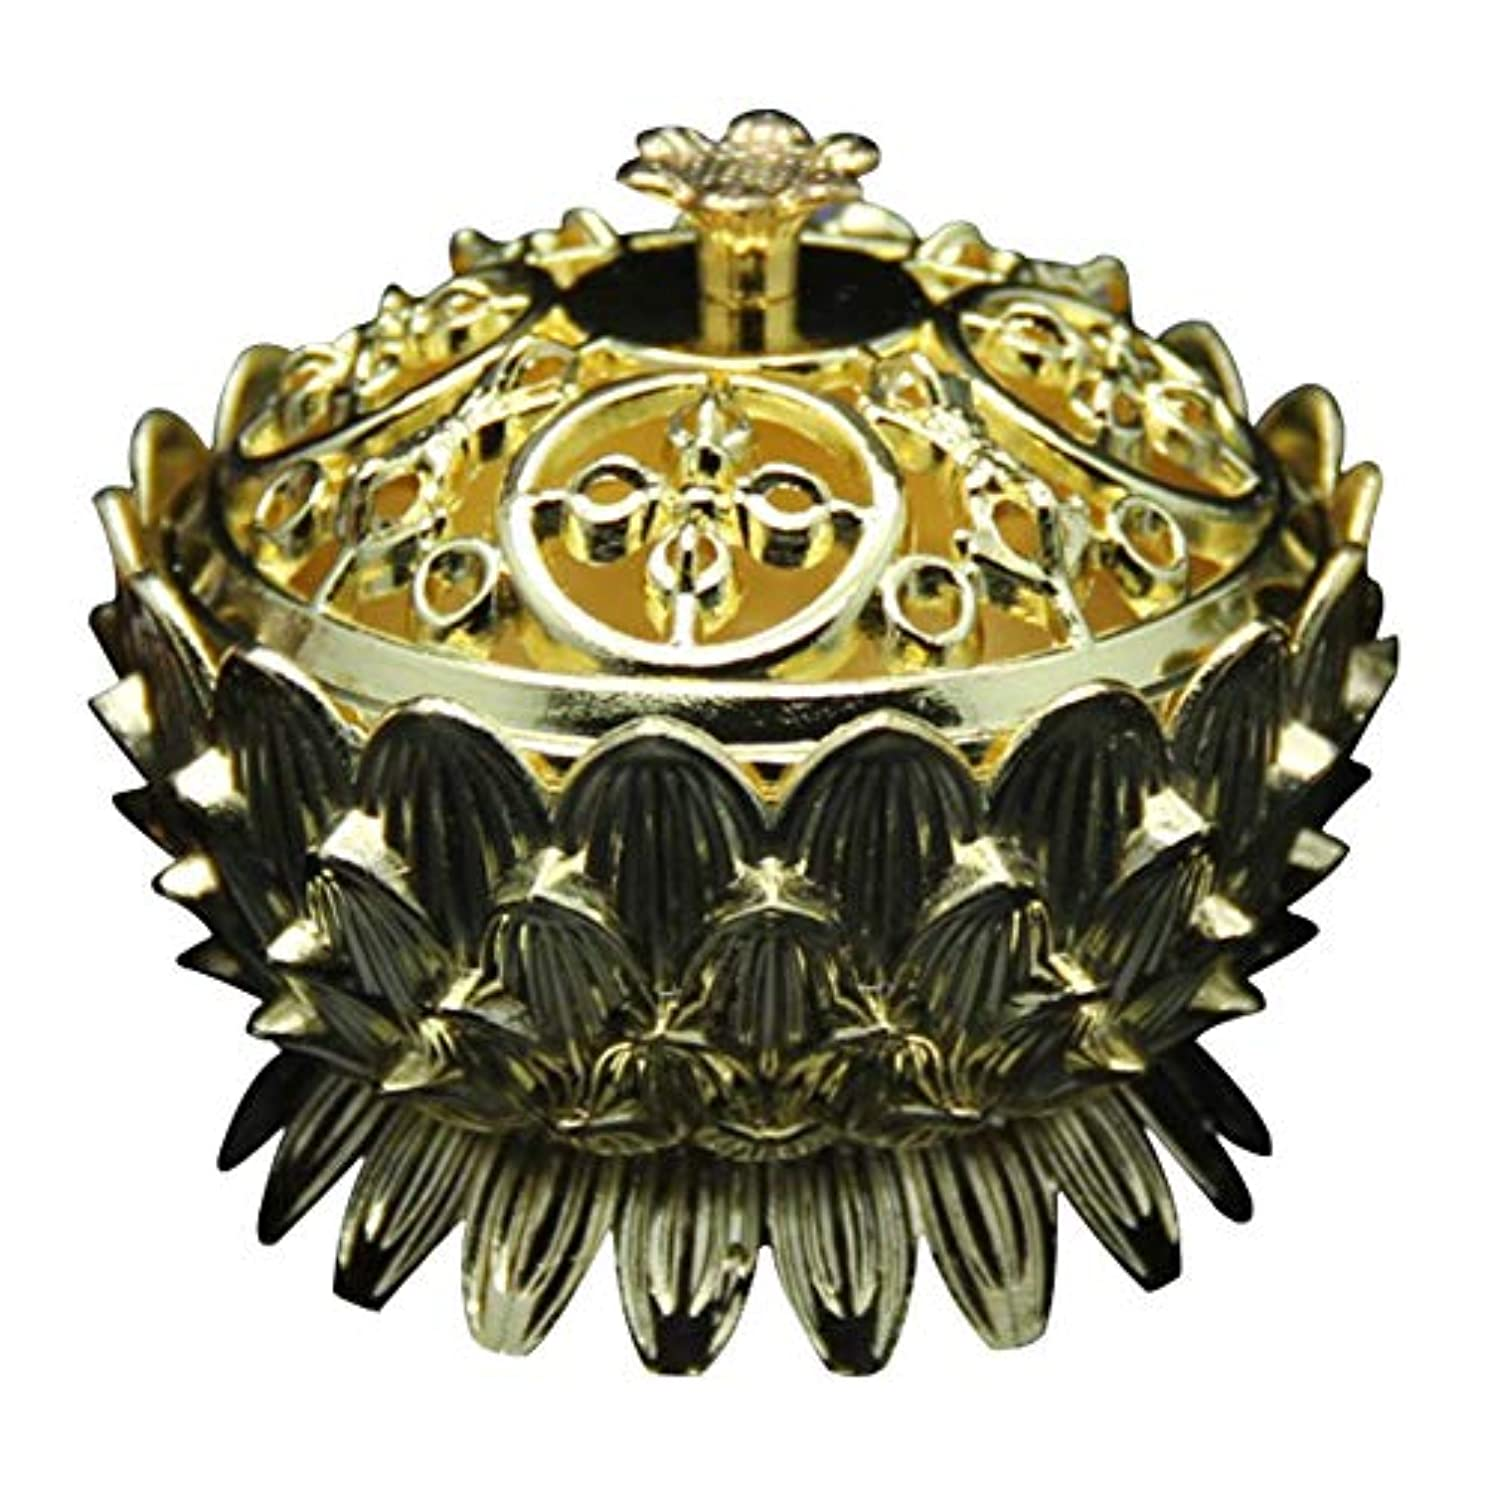 Retro Zinc Copper Alloy Bronze Incense Burner Home Decor Mini Lotus Tibet Incense Burner Holder Fit for Stick...